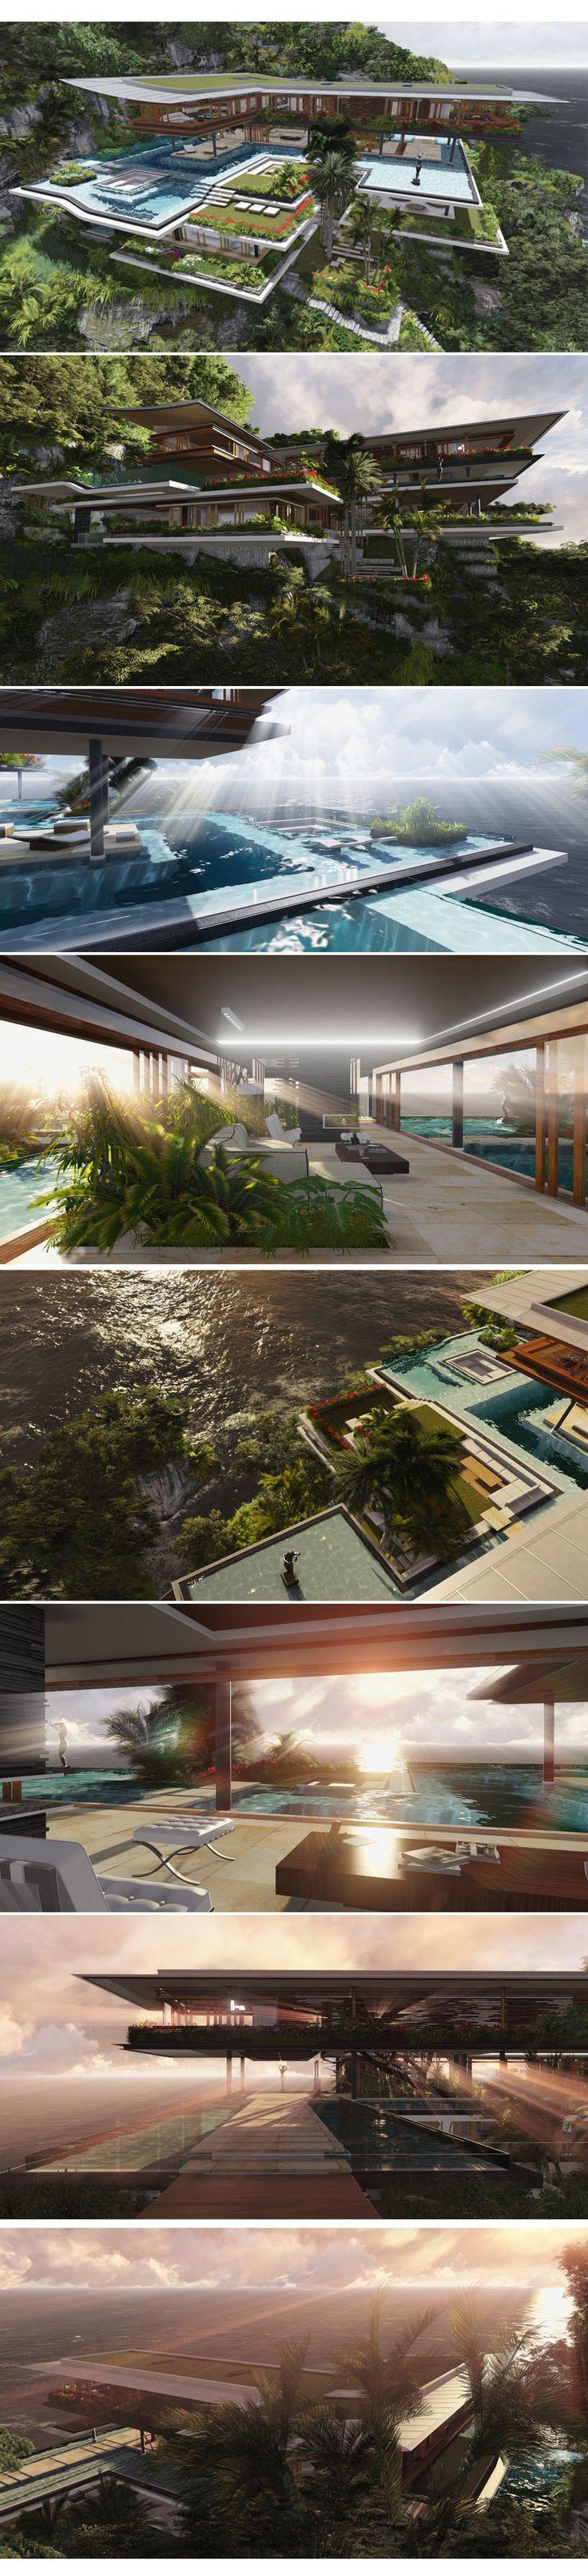 Xálima Island House by Martin Ferrero Architecture – Markus Schilling